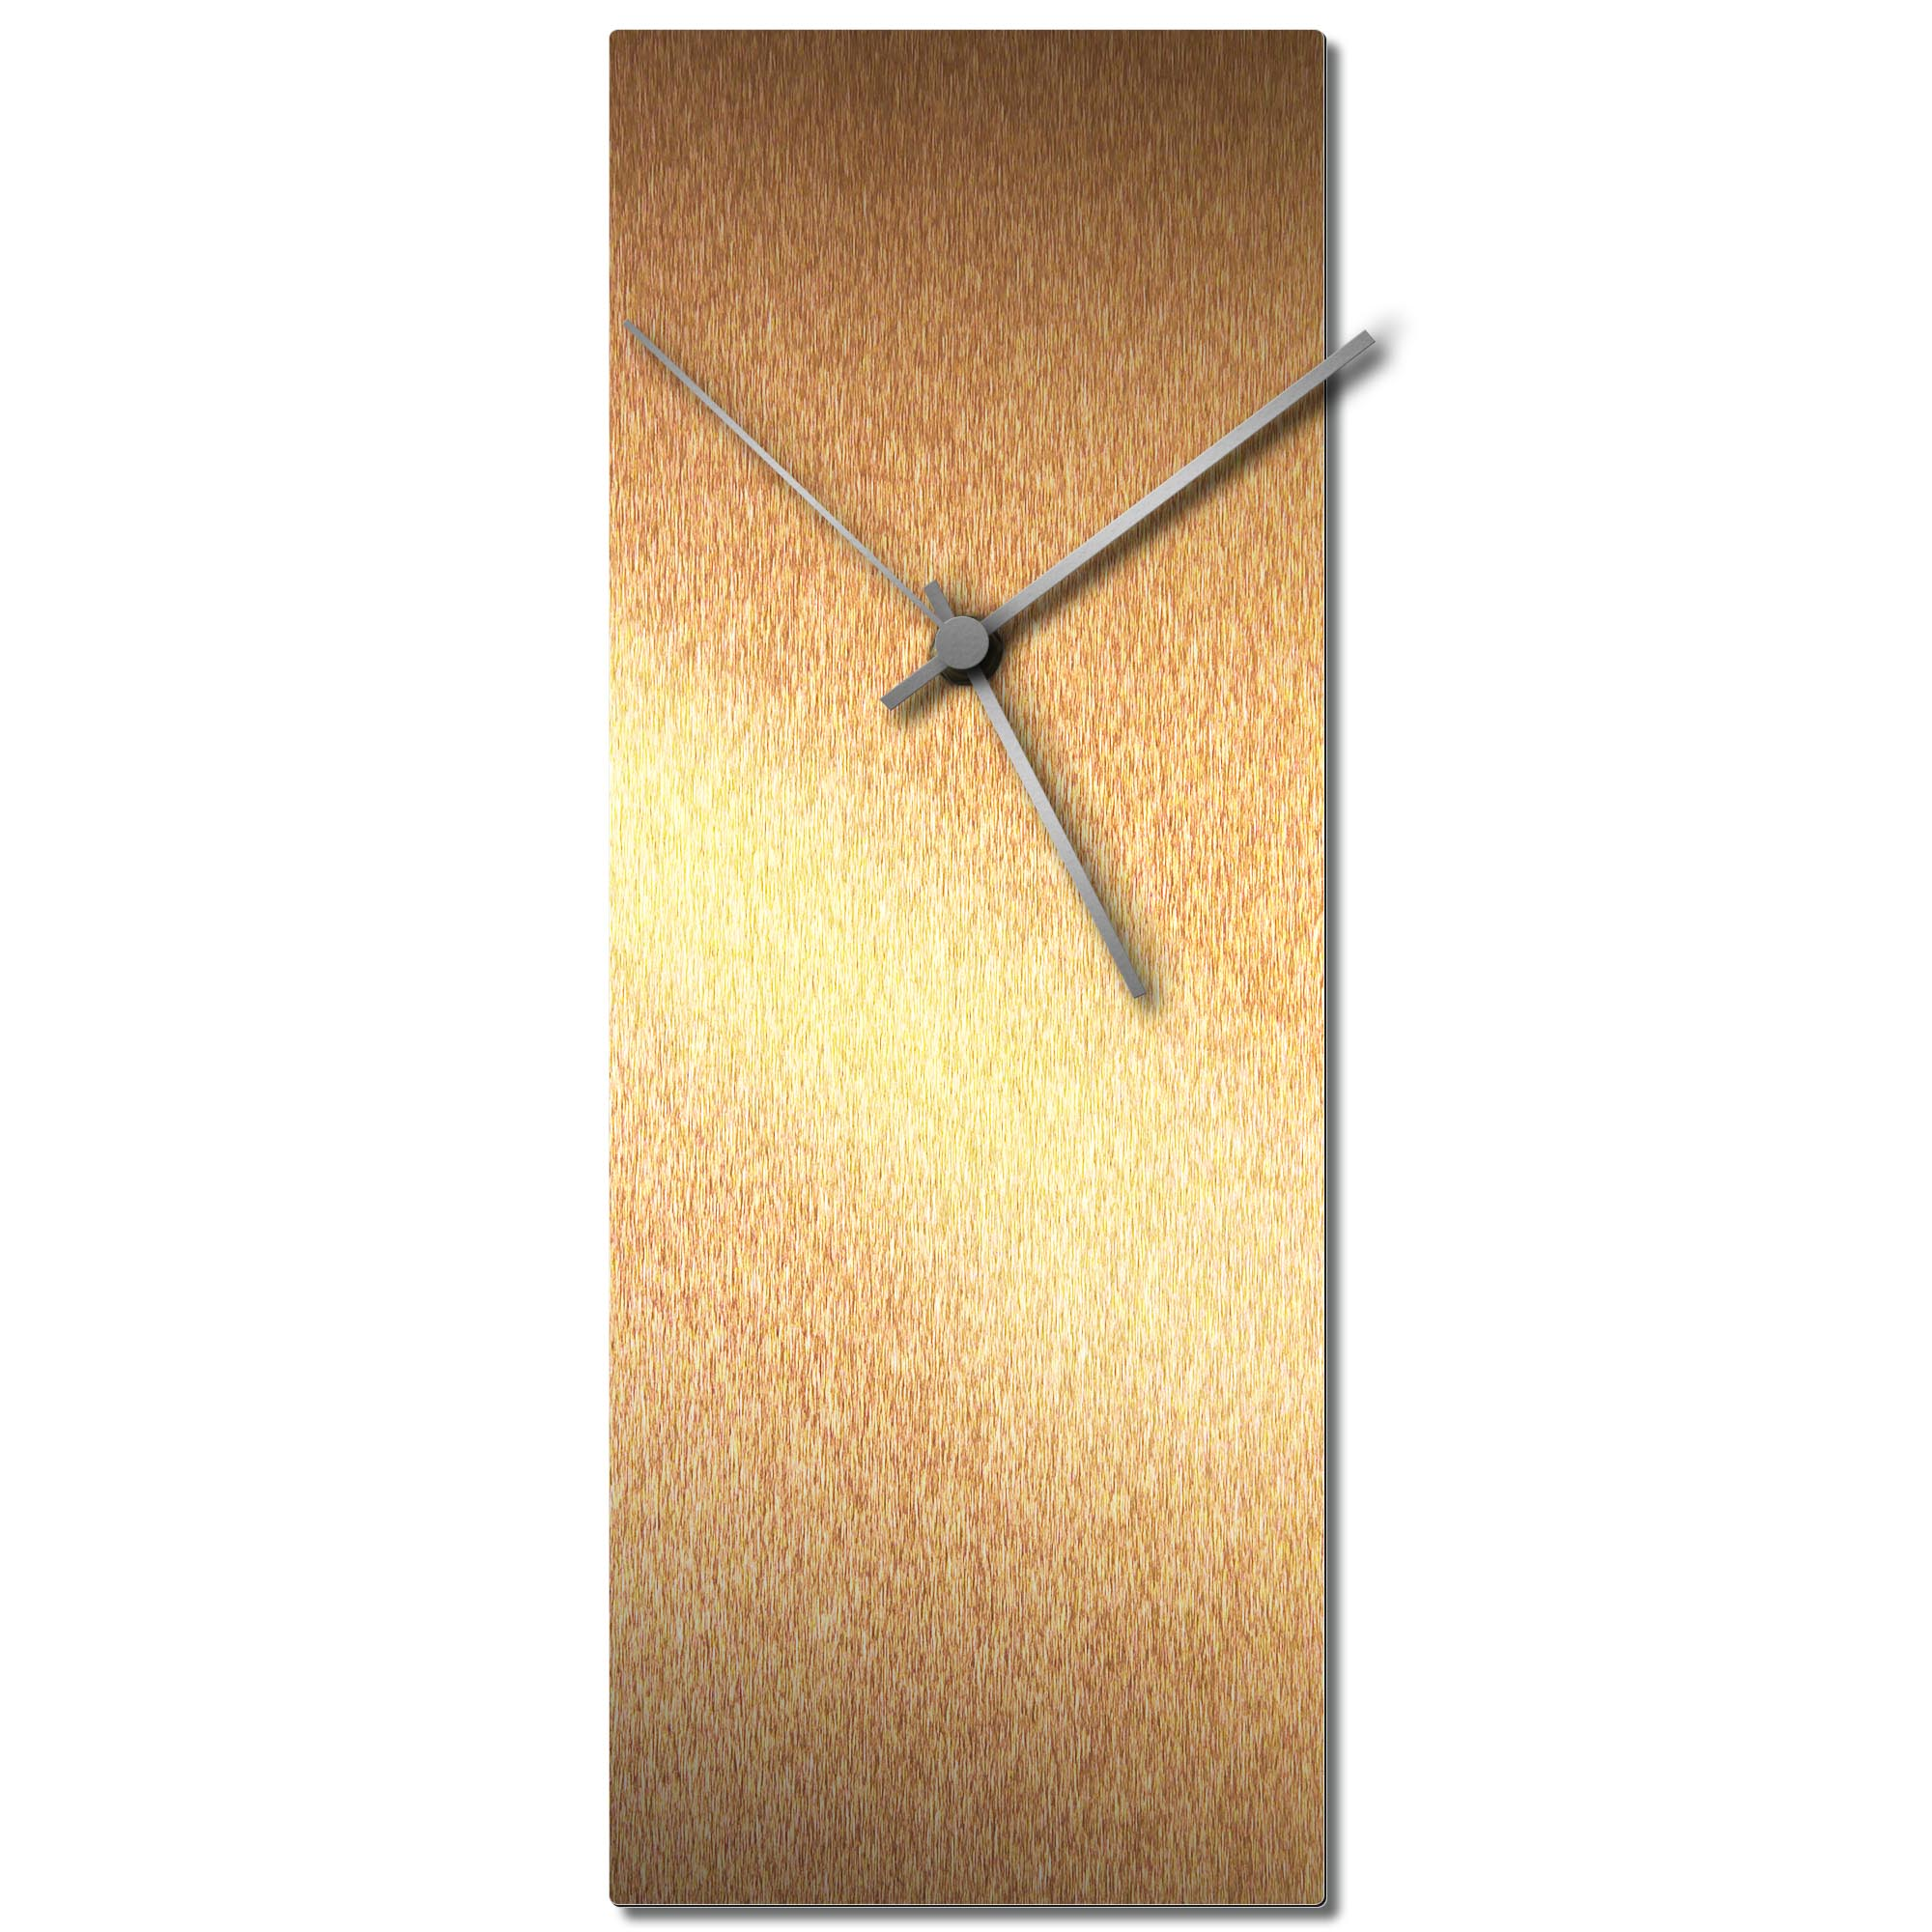 Adam Schwoeppe 'Bronzesmith Clock Large Silver' Midcentury Modern Style Wall Clock